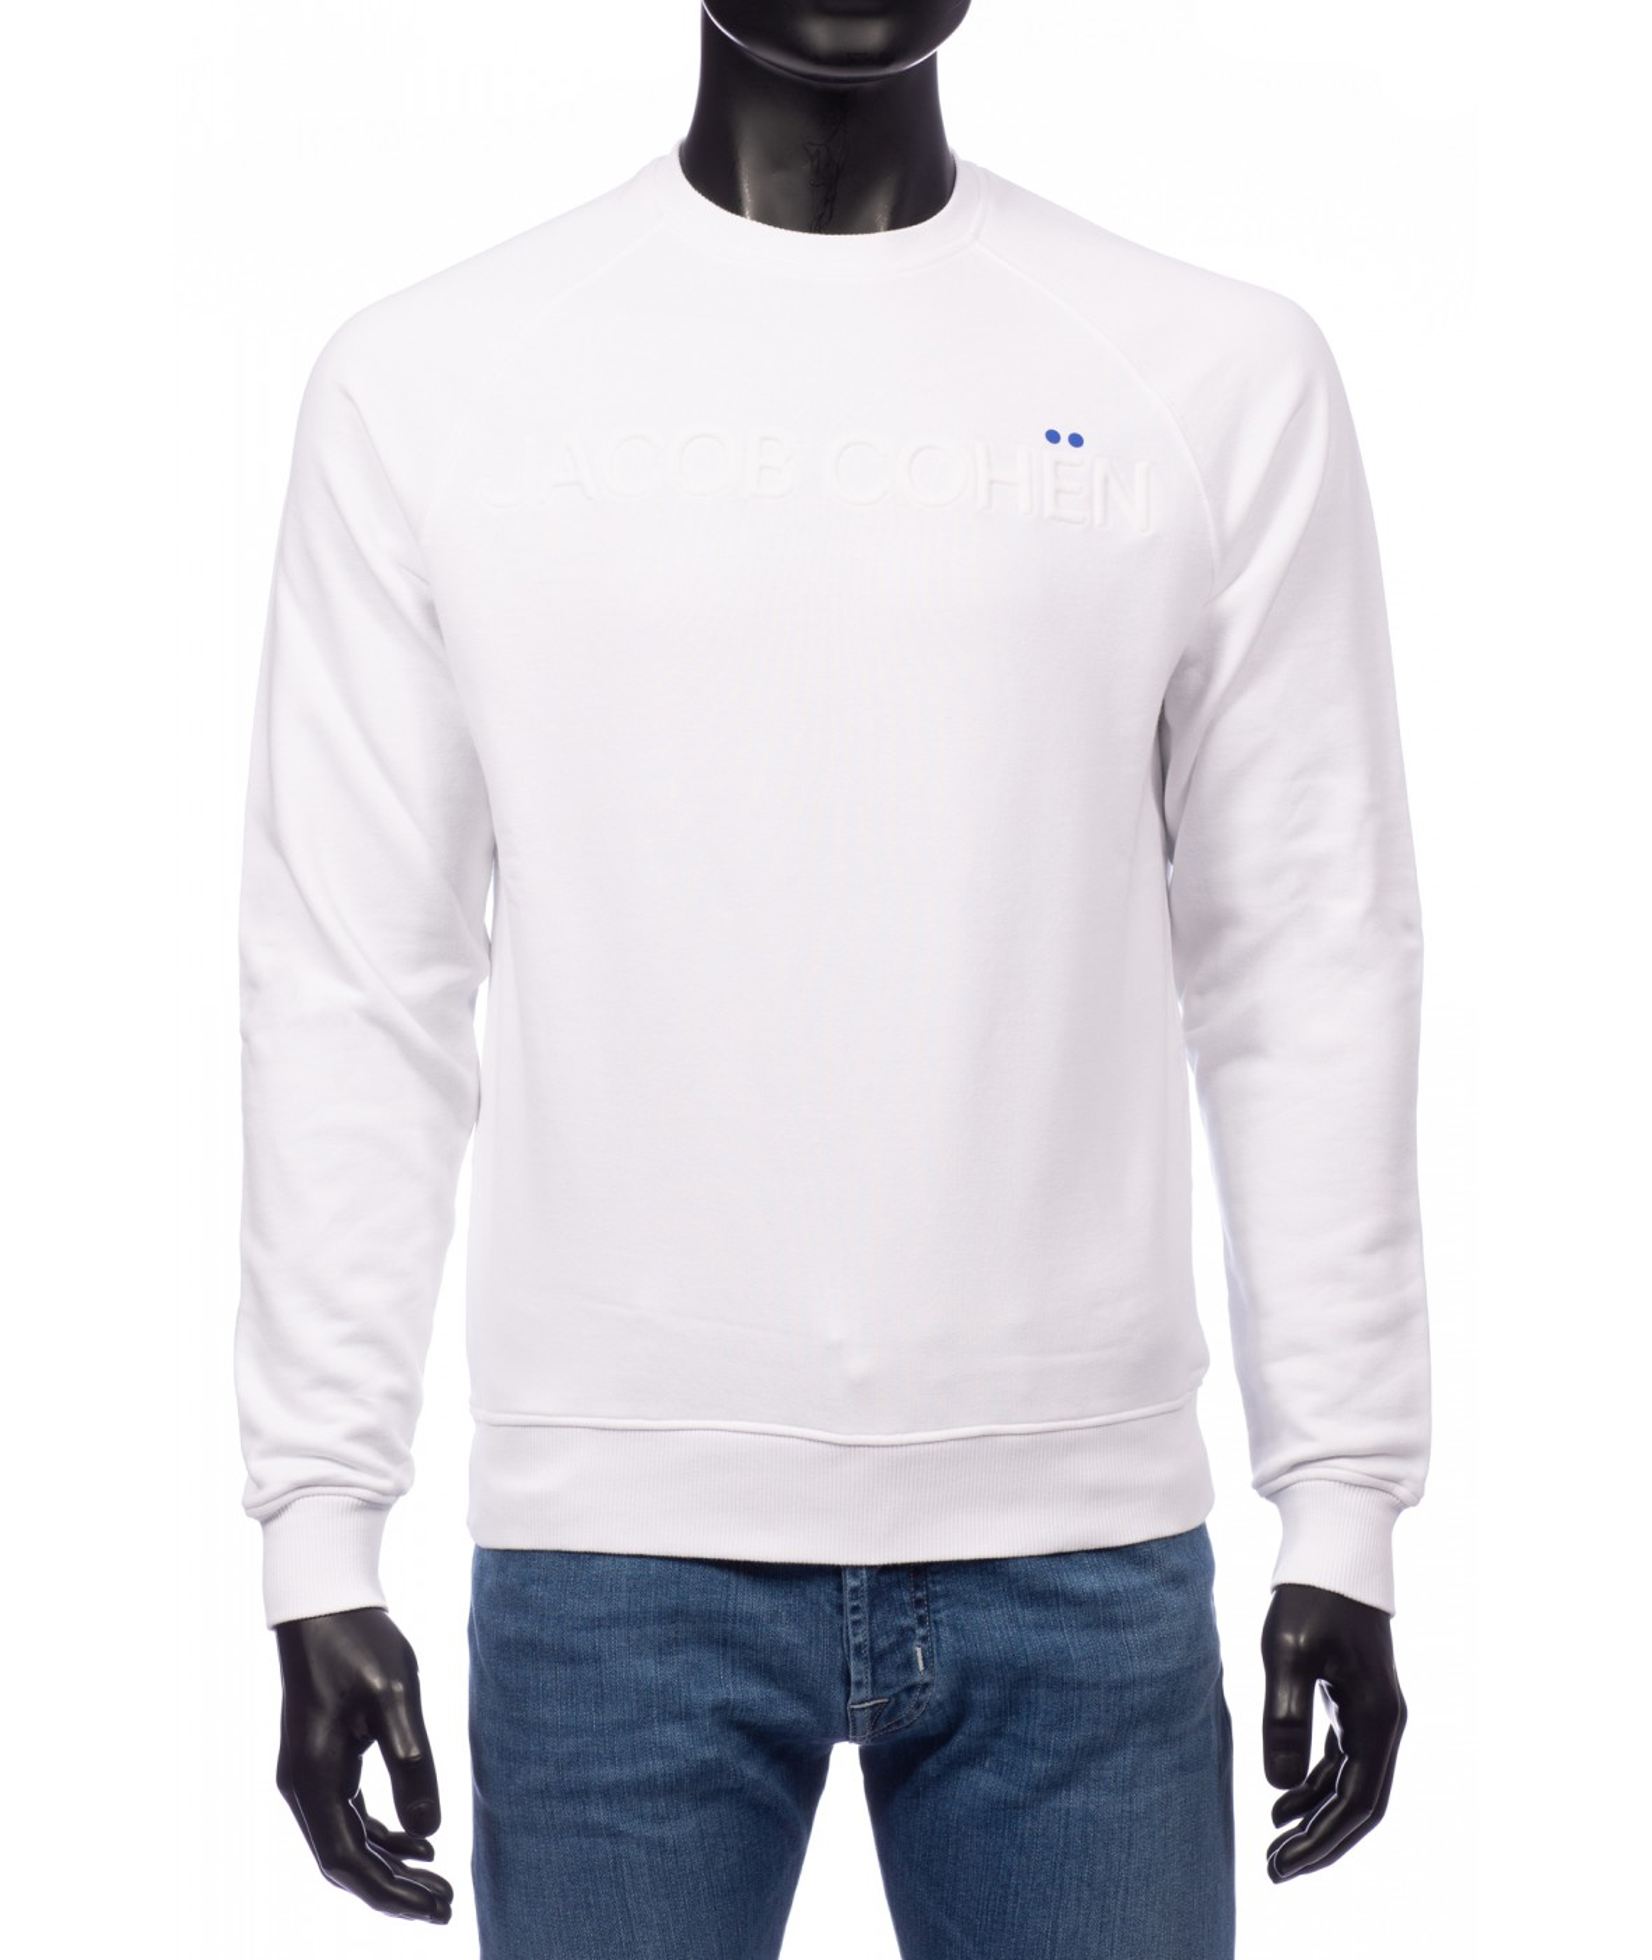 Jacob Cohen Sweater Blanc (33973)